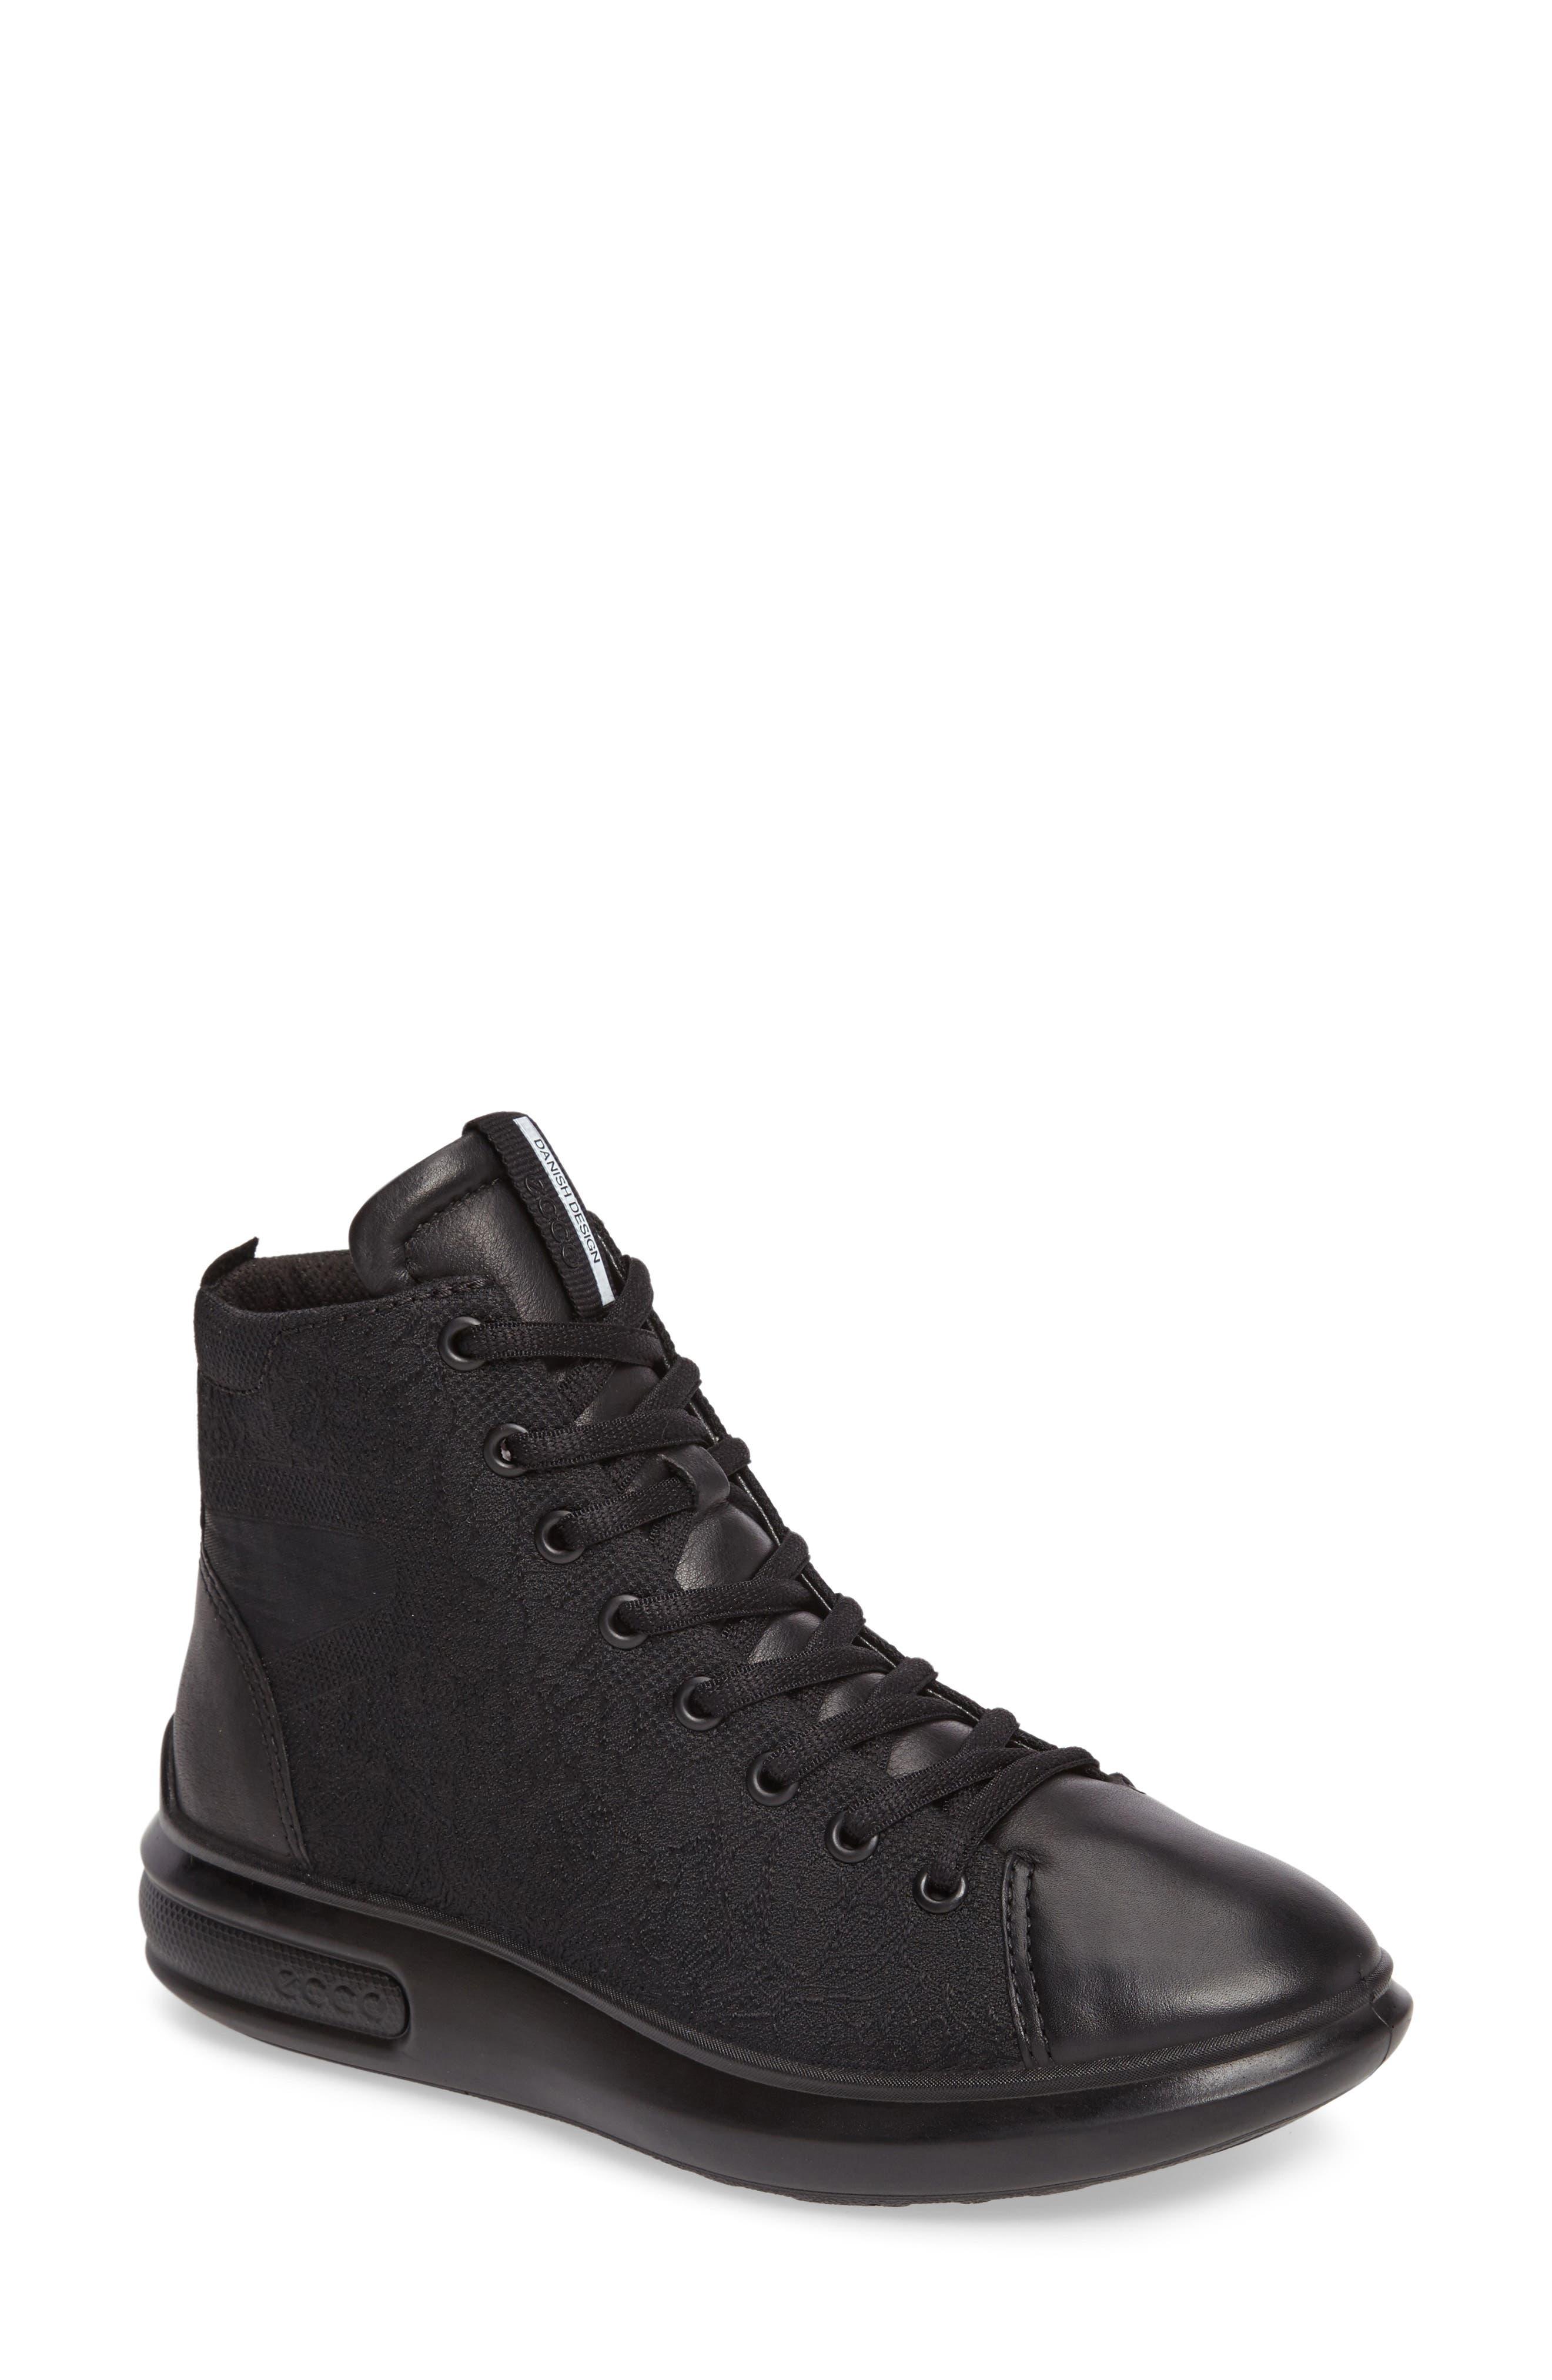 ECCO Soft 3 High Top Sneaker (Women